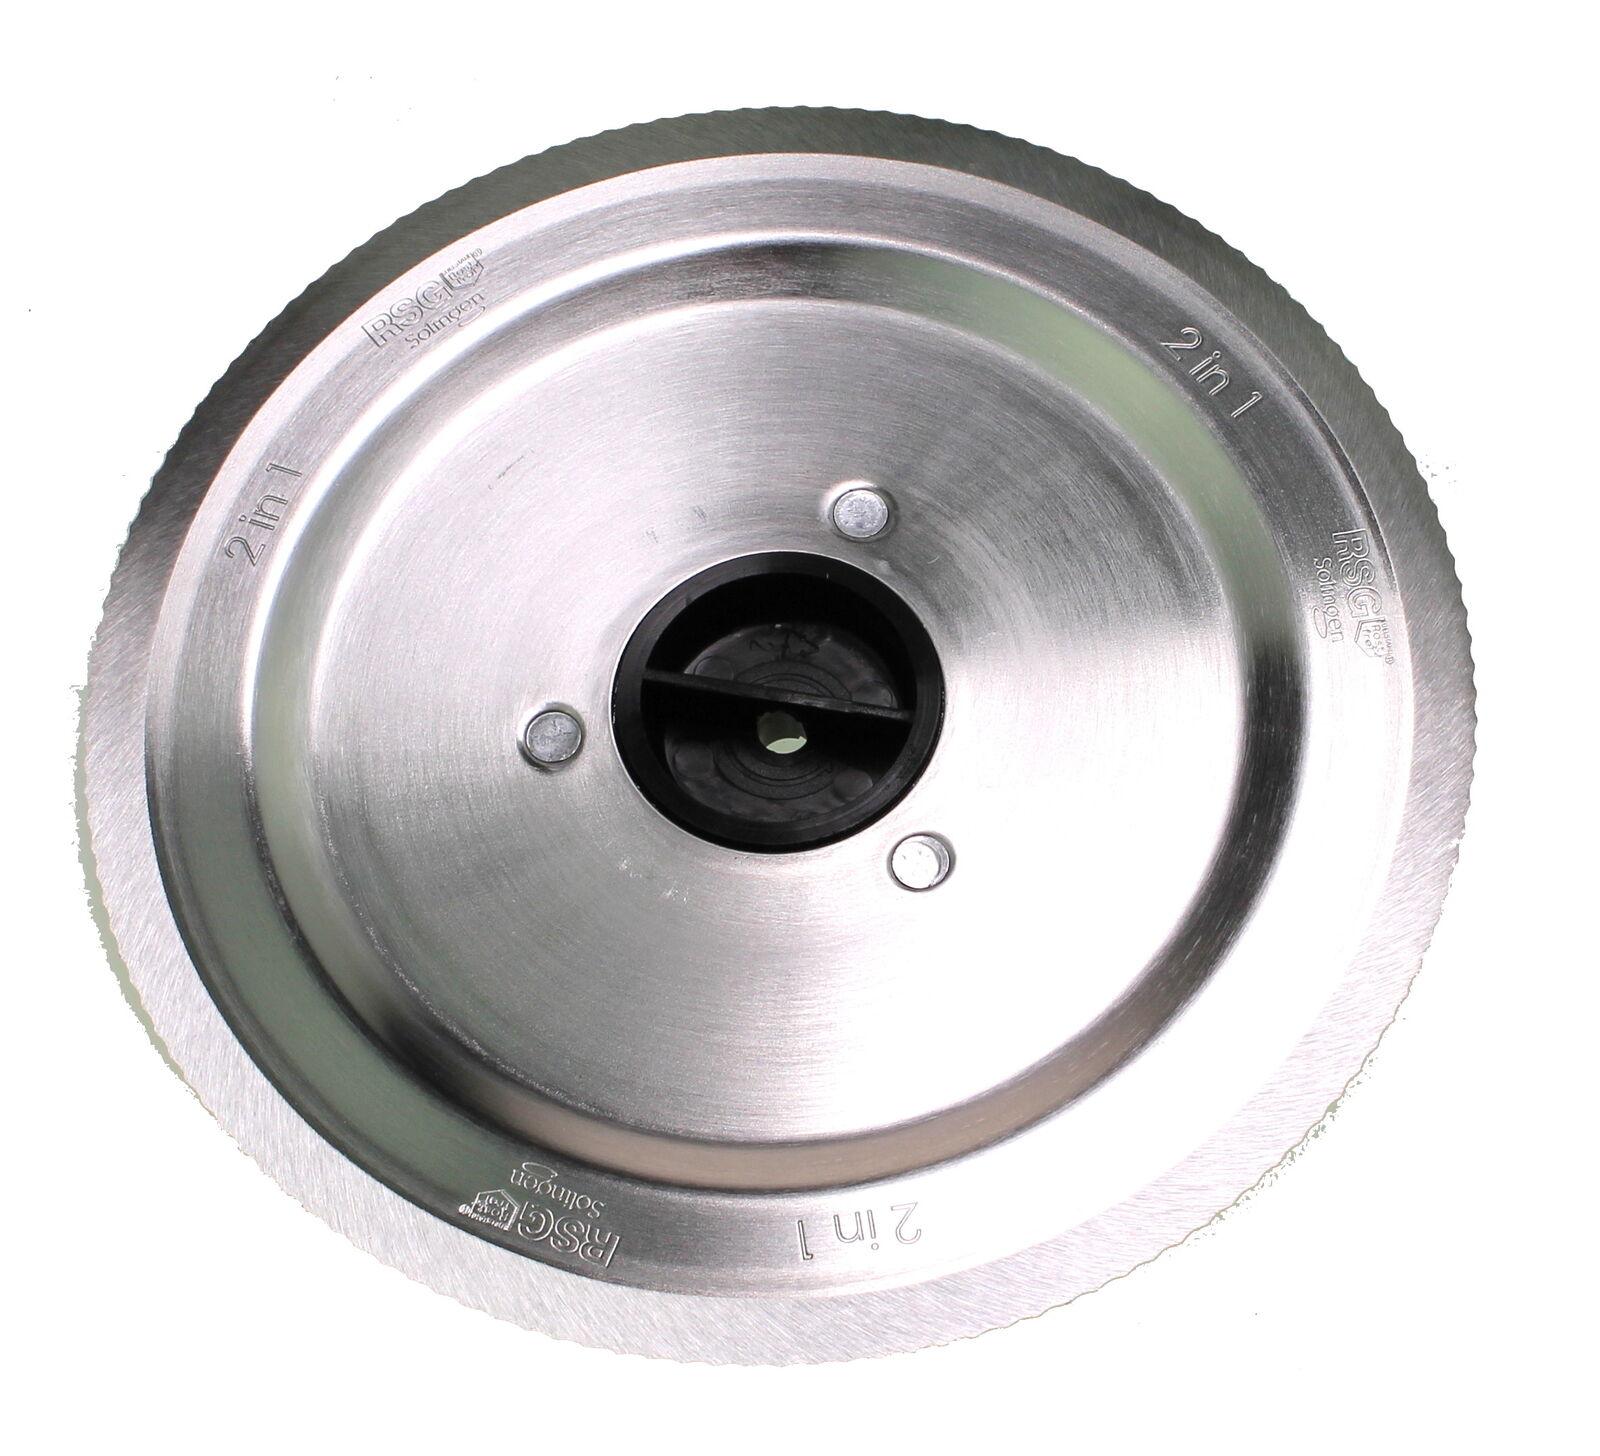 Bosch 12012175 Universal Blade for mas6151m, mas6151r, All Cutters